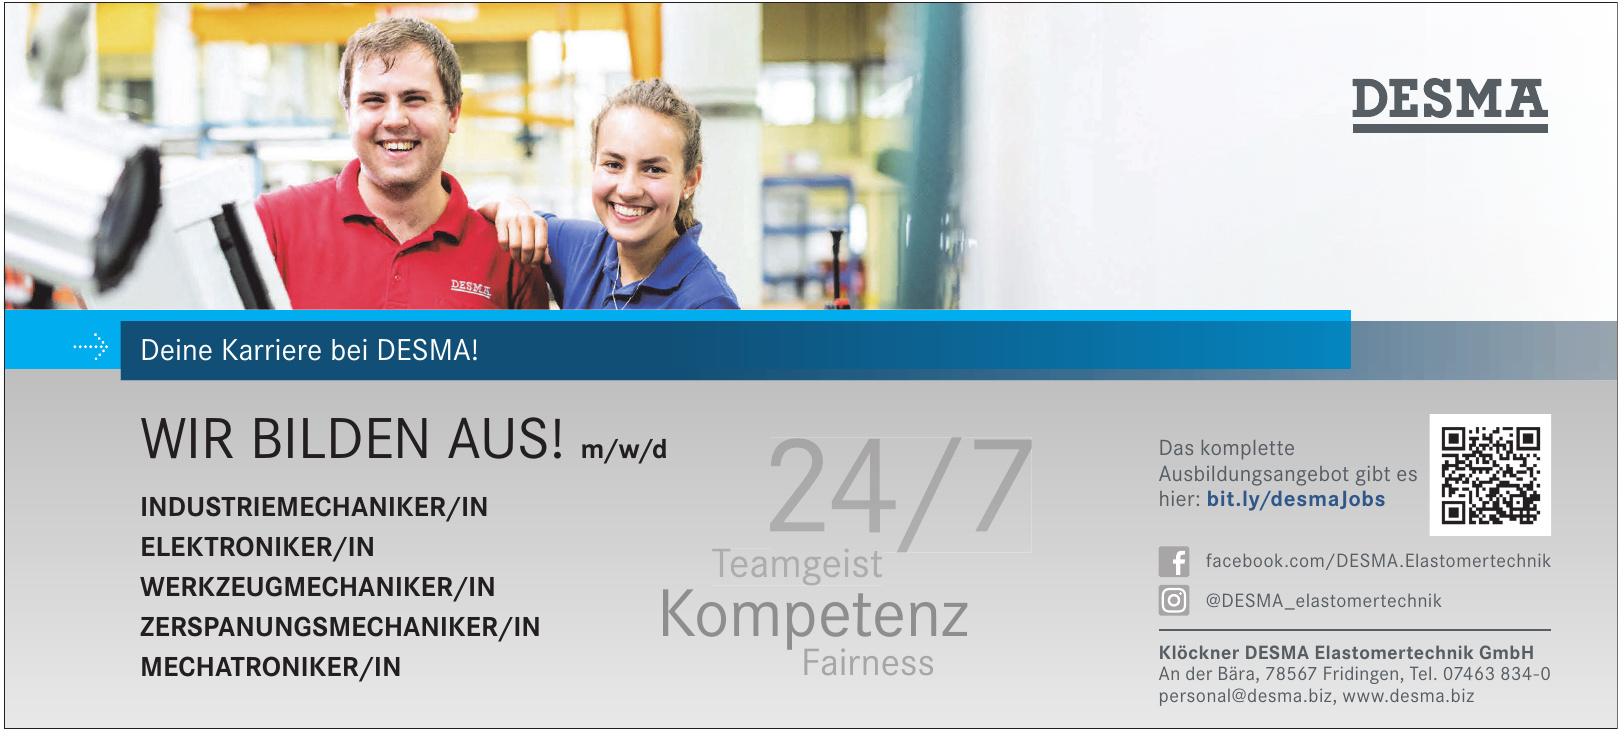 Klöckner DESMA Elastomertechnik GmbH